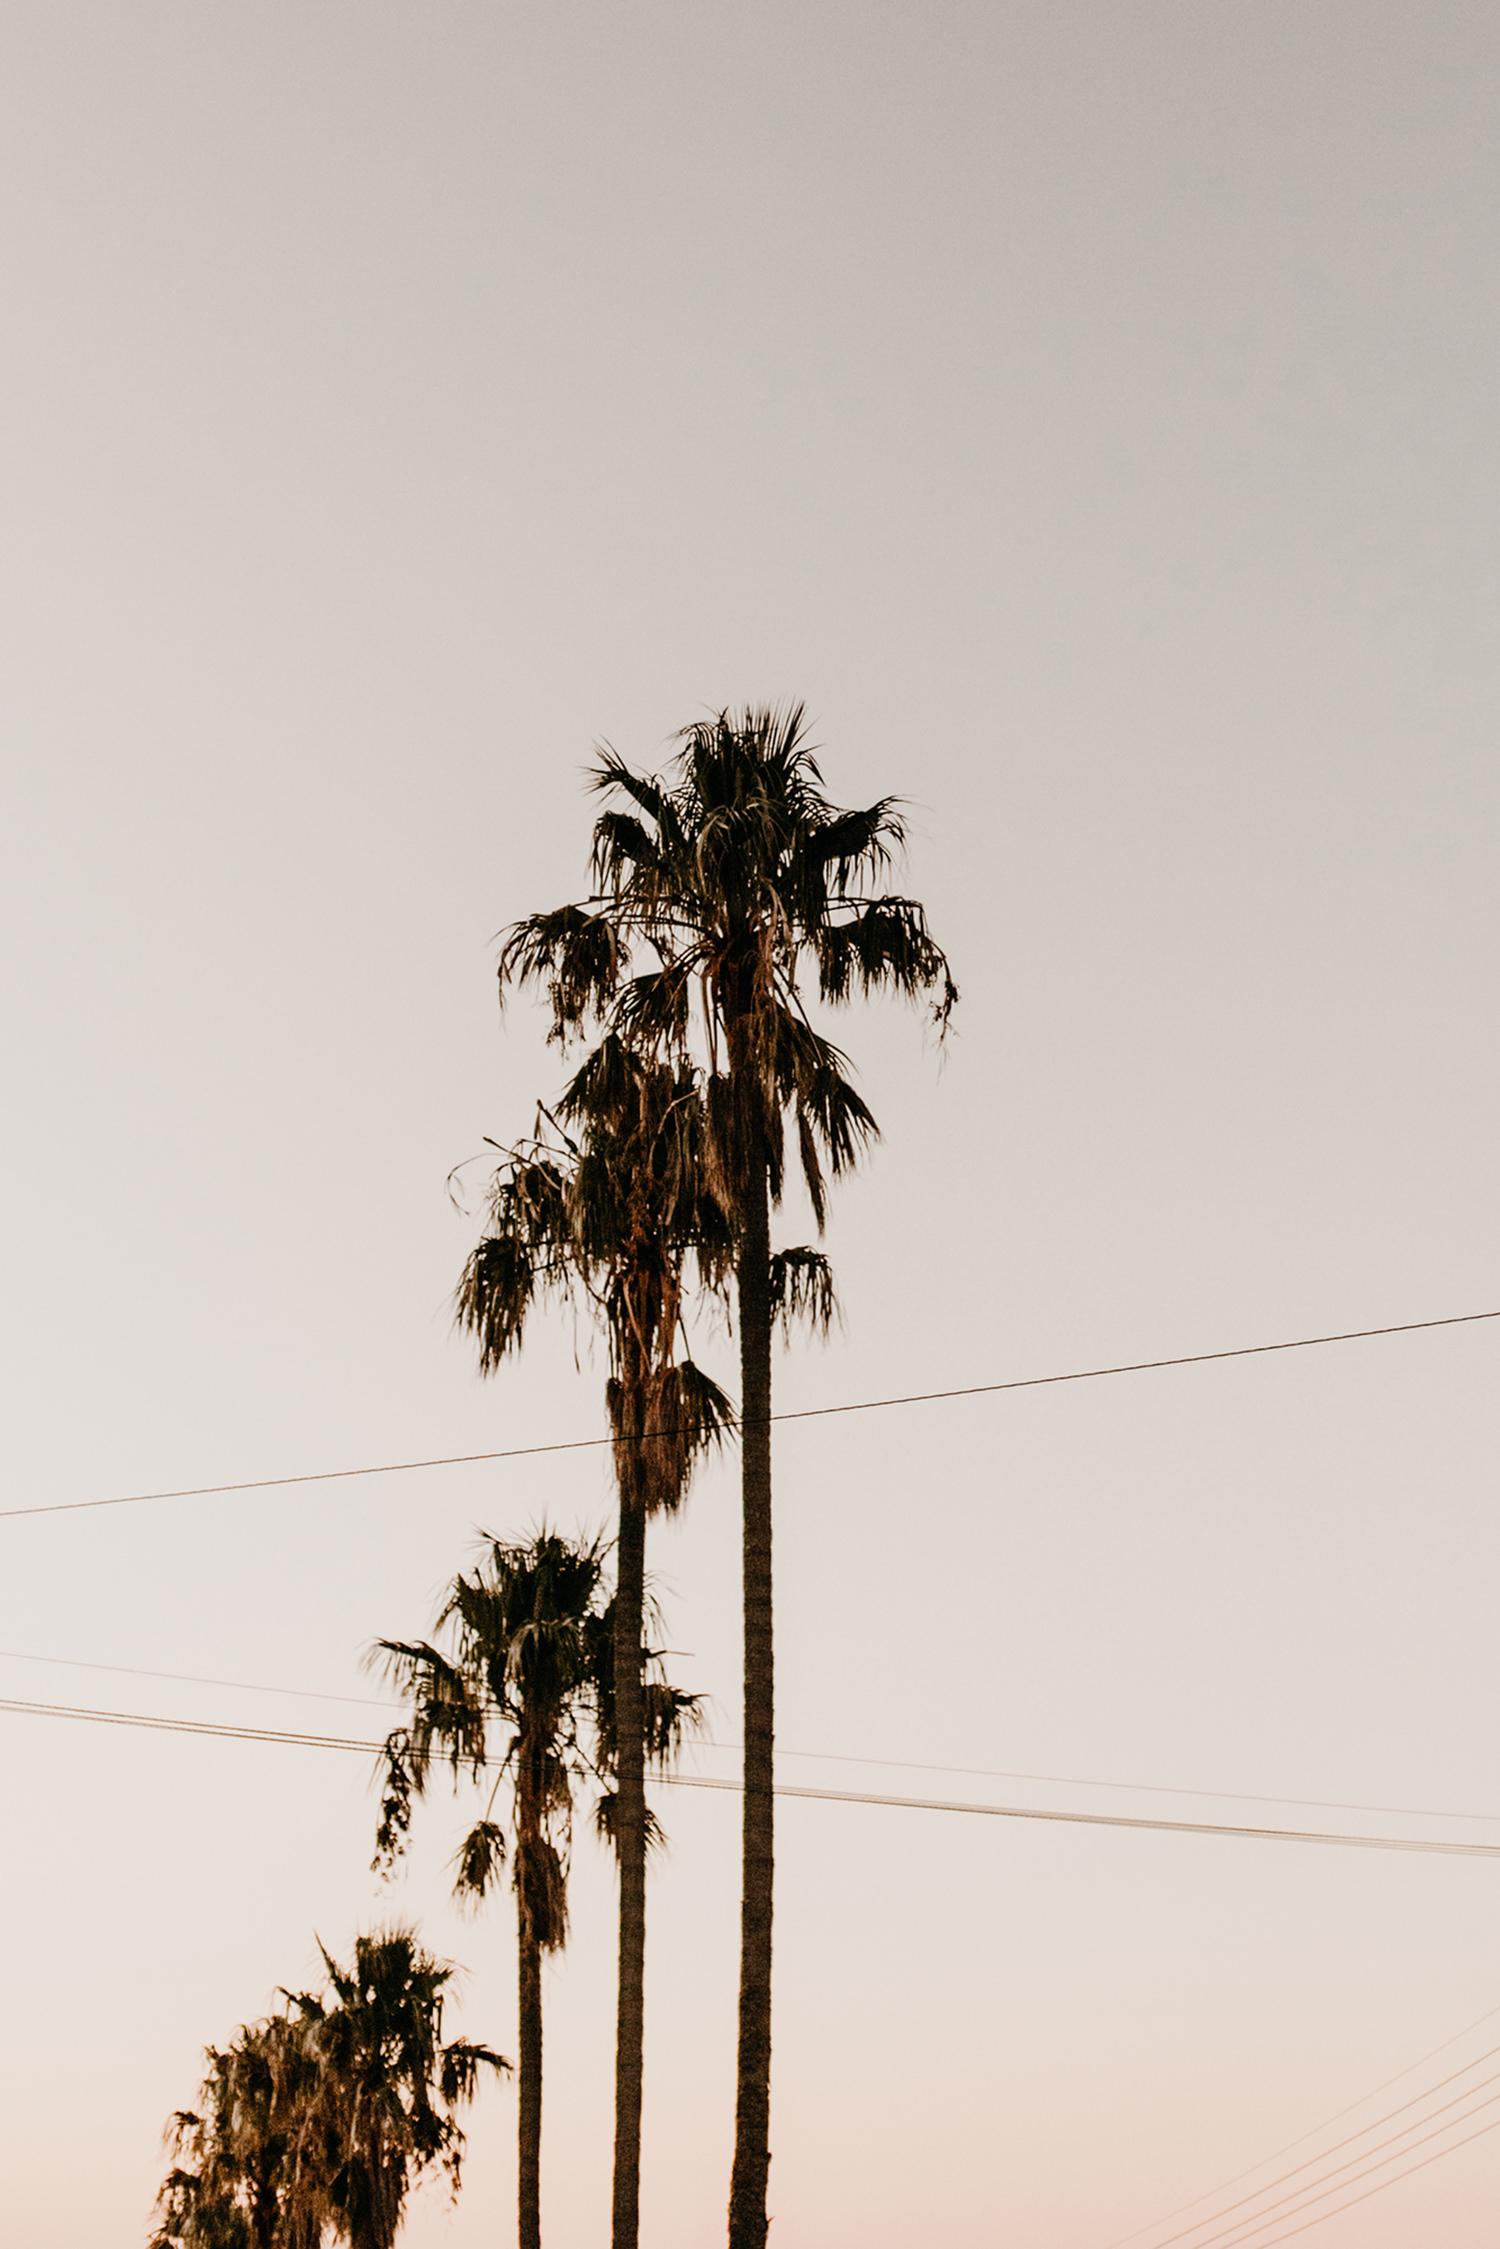 Fotoshooting-Fotograf-People-Lifestyle-Suedafrika-Anna-Fichtner-c-7